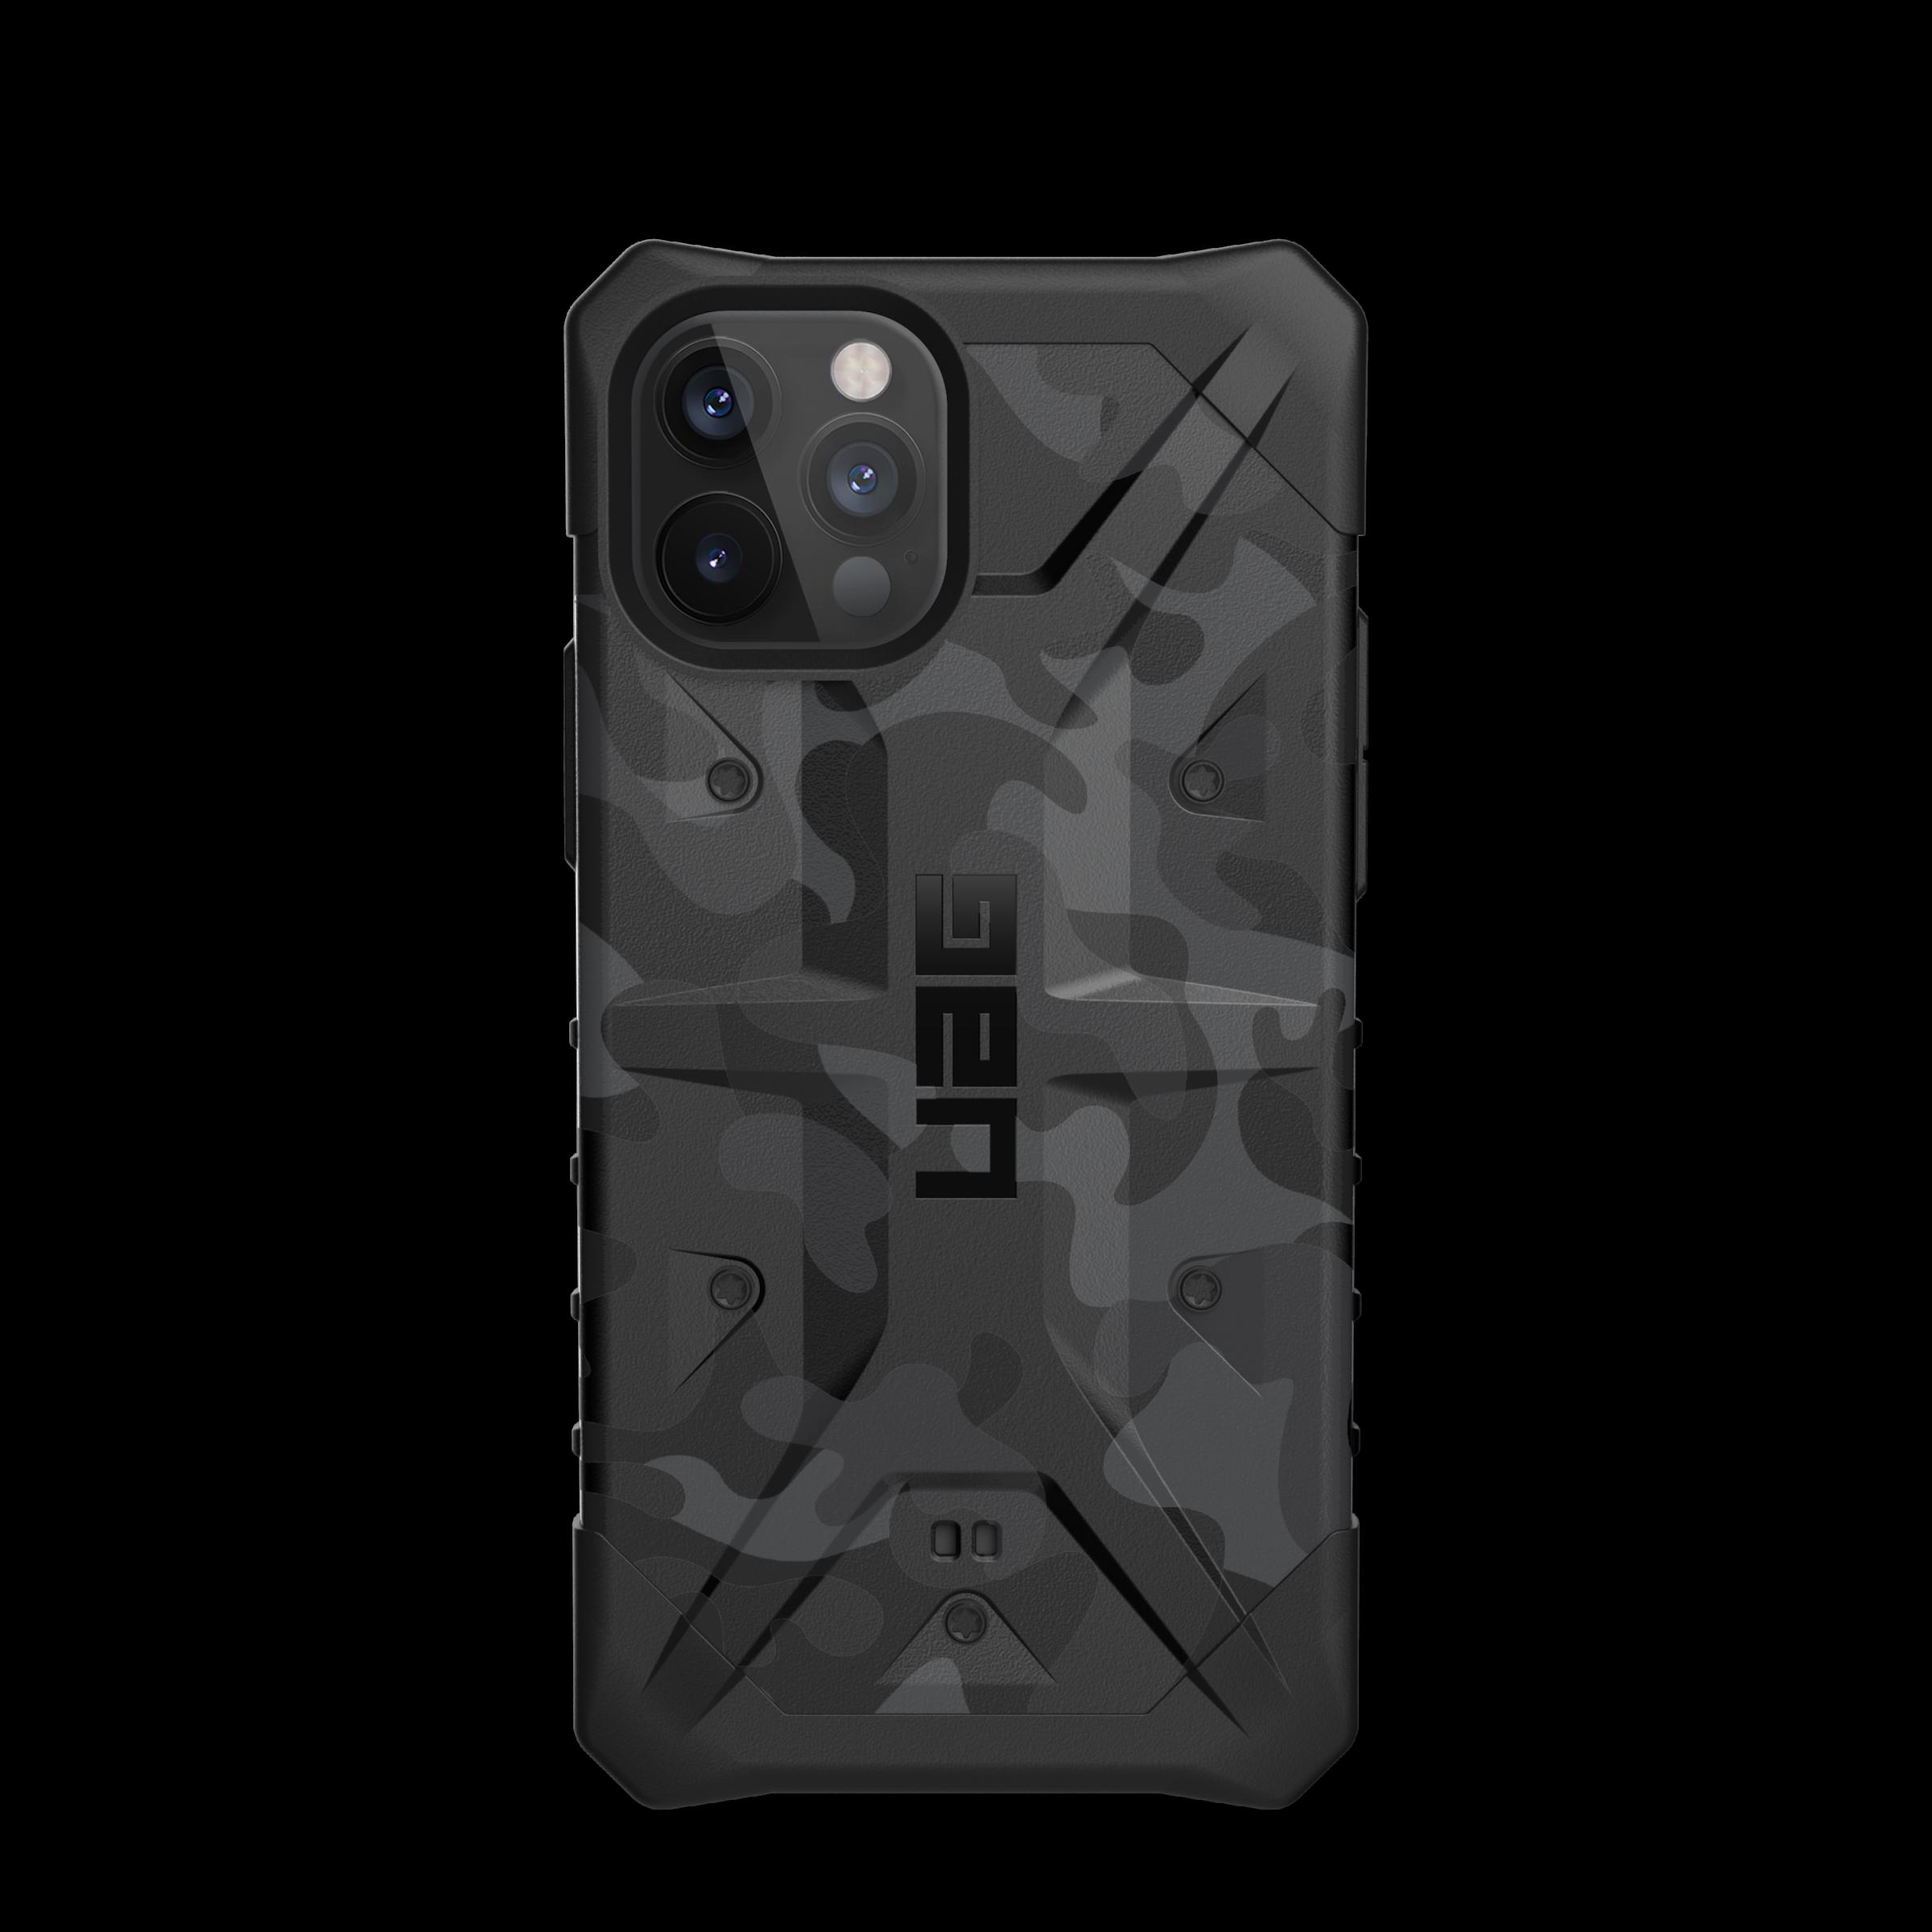 Pathfinder SE Series Case iPhone 12/12 Pro Black Midnight Camo